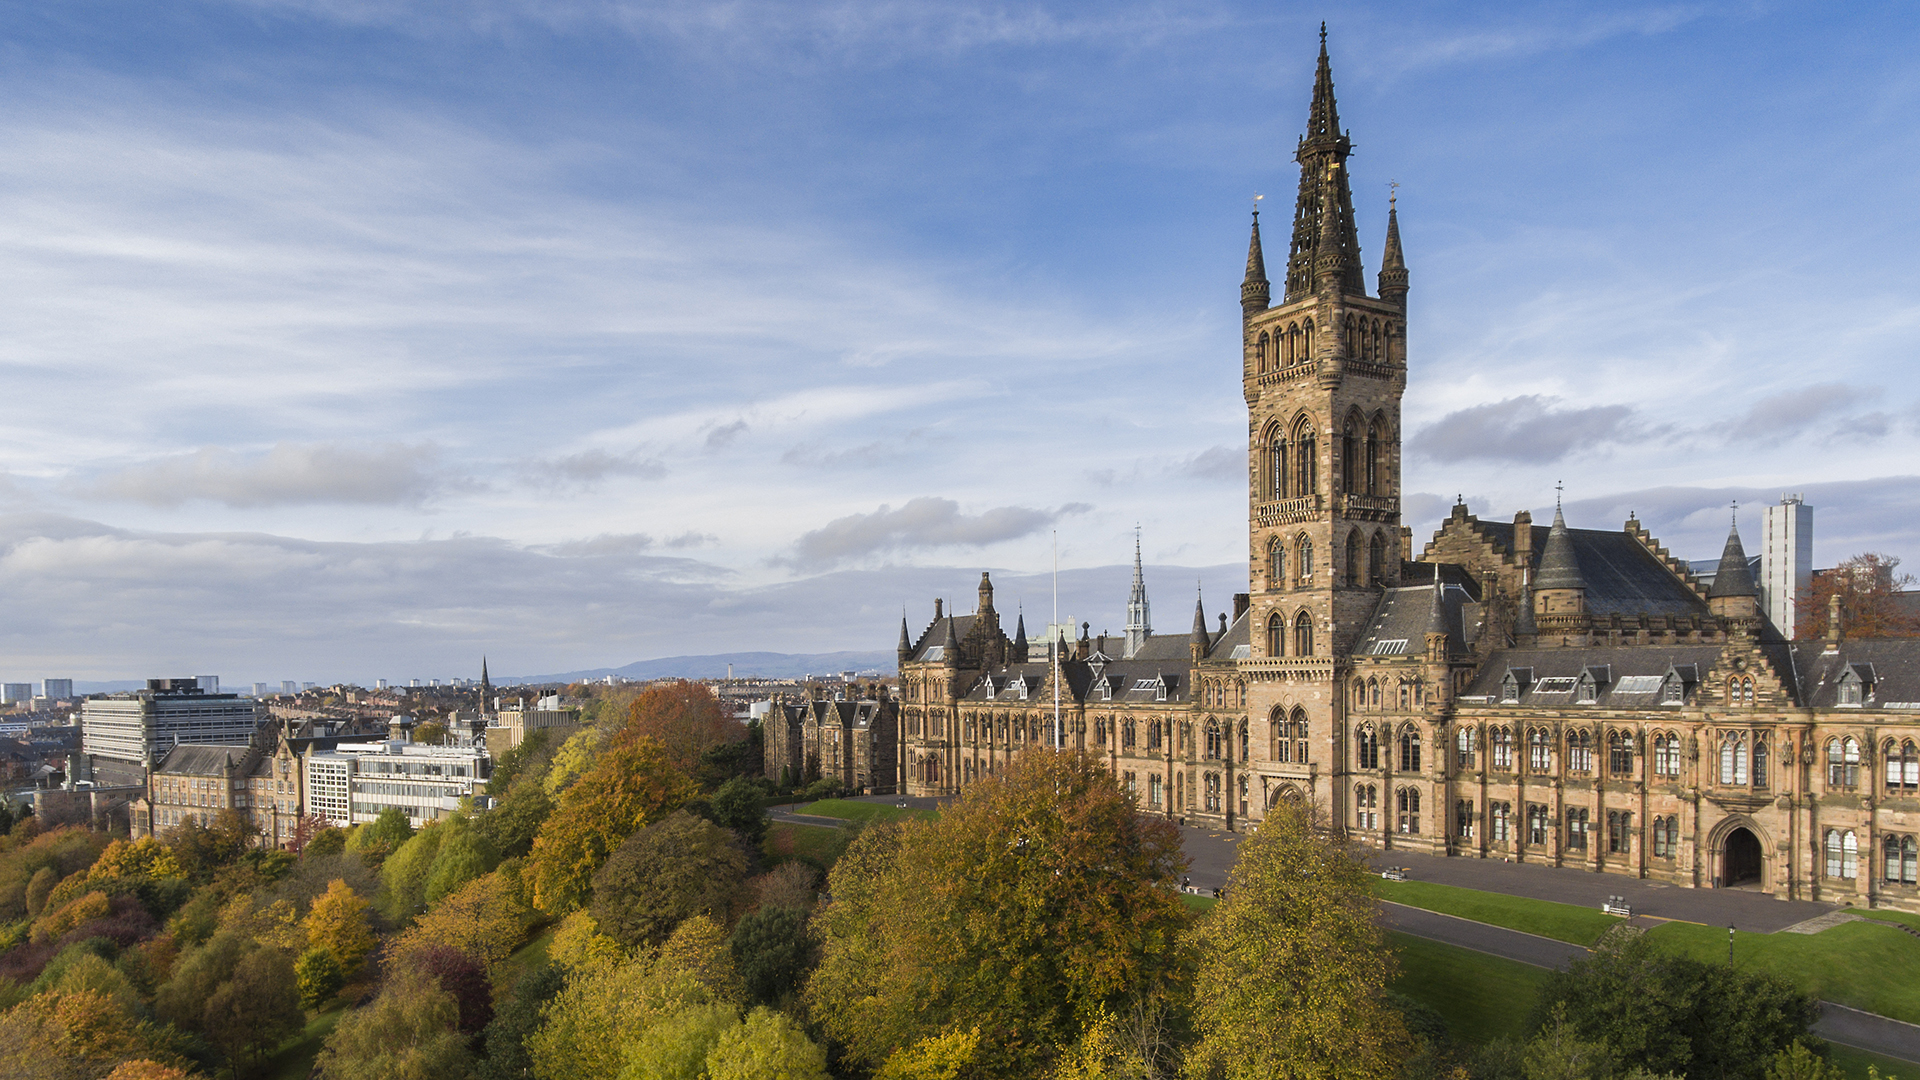 University of Glasgow / Glasgow University มหาวิทยาลัยในอังกฤษ